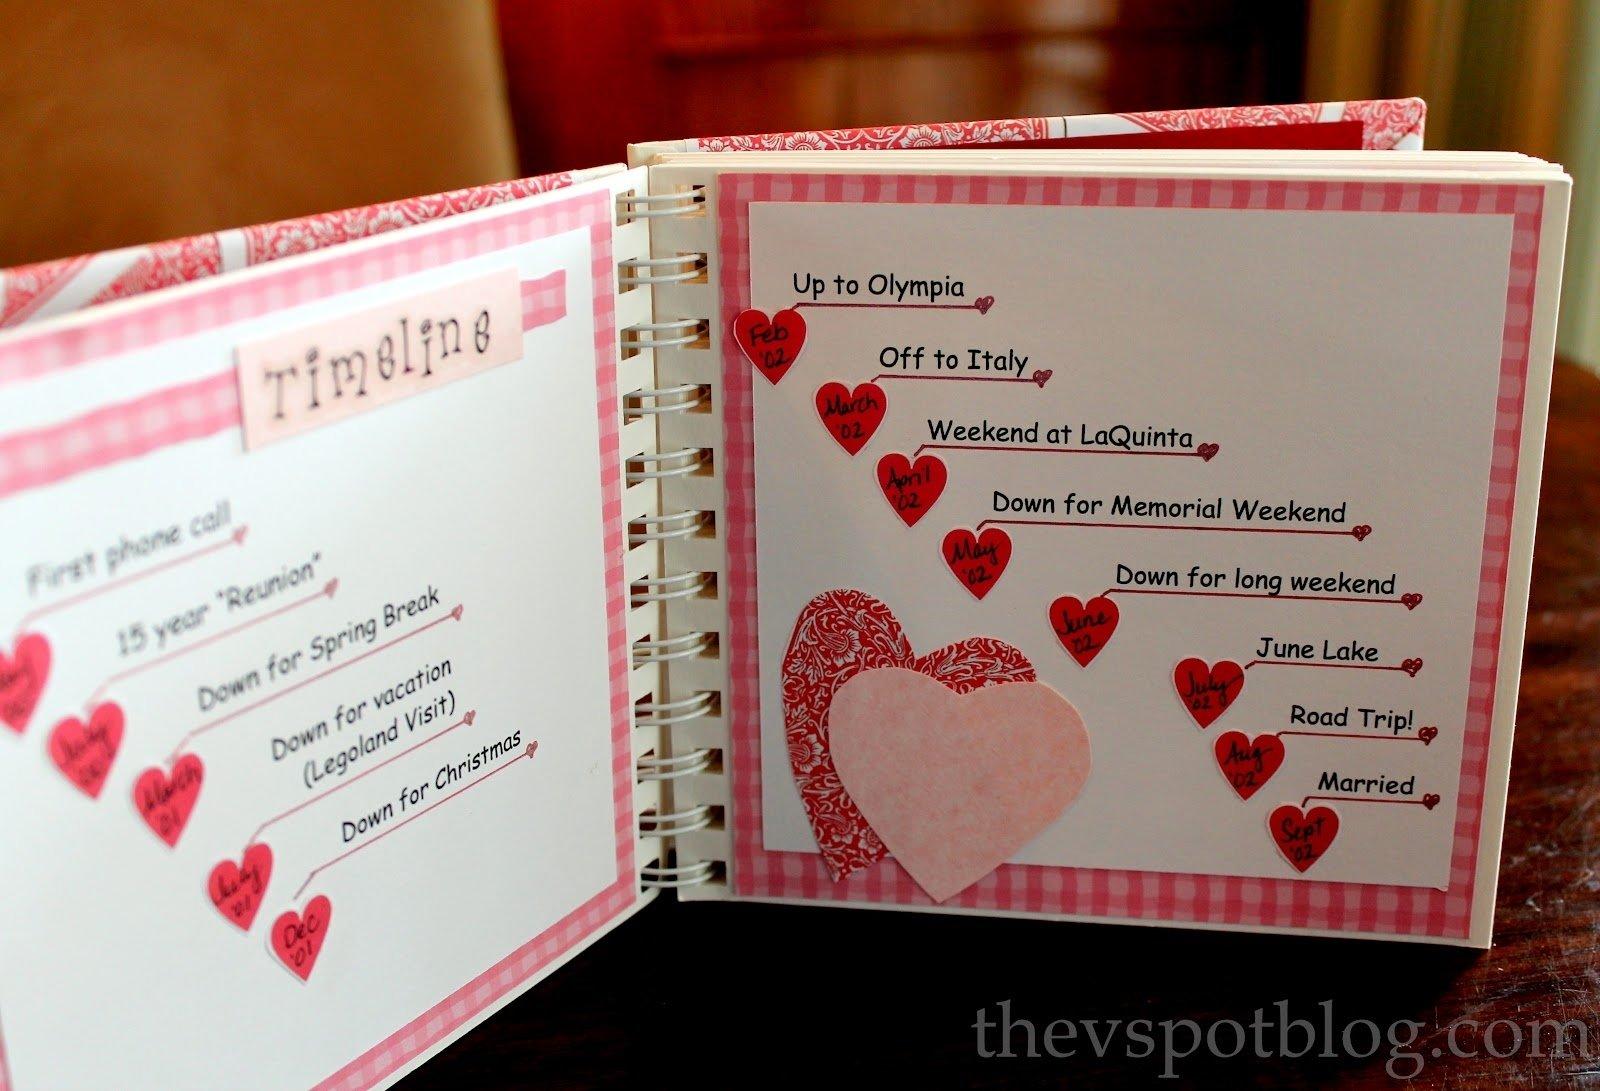 10 Wonderful Ideas For Valentines Day For Him valentine day new creative ideas boyfriend husband him home art 30 2020